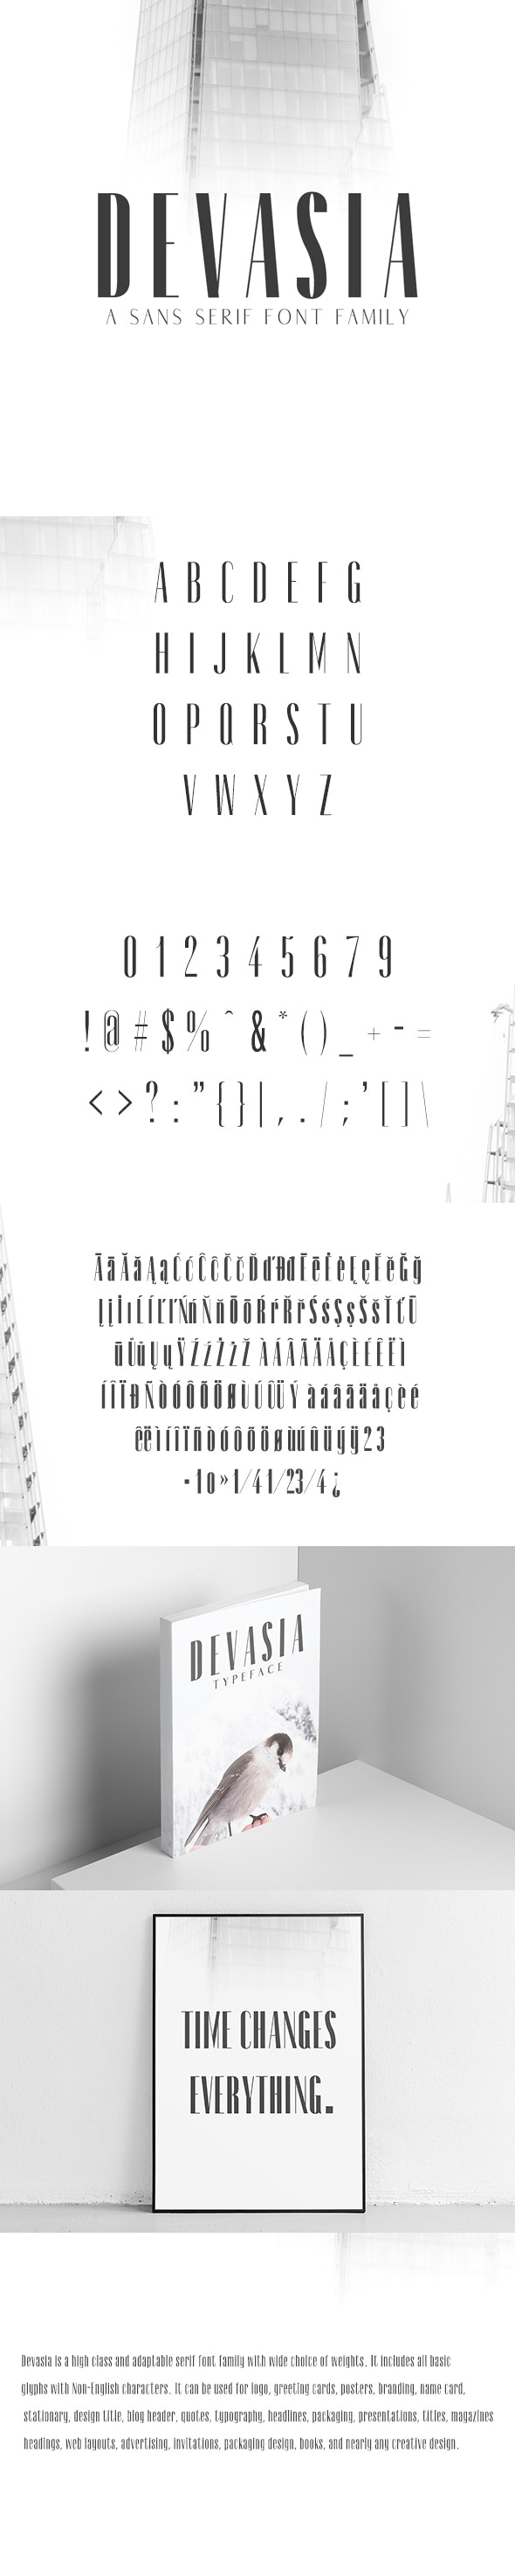 Devasia Sans Serif Font Family Pack - Sans-Serif Fonts